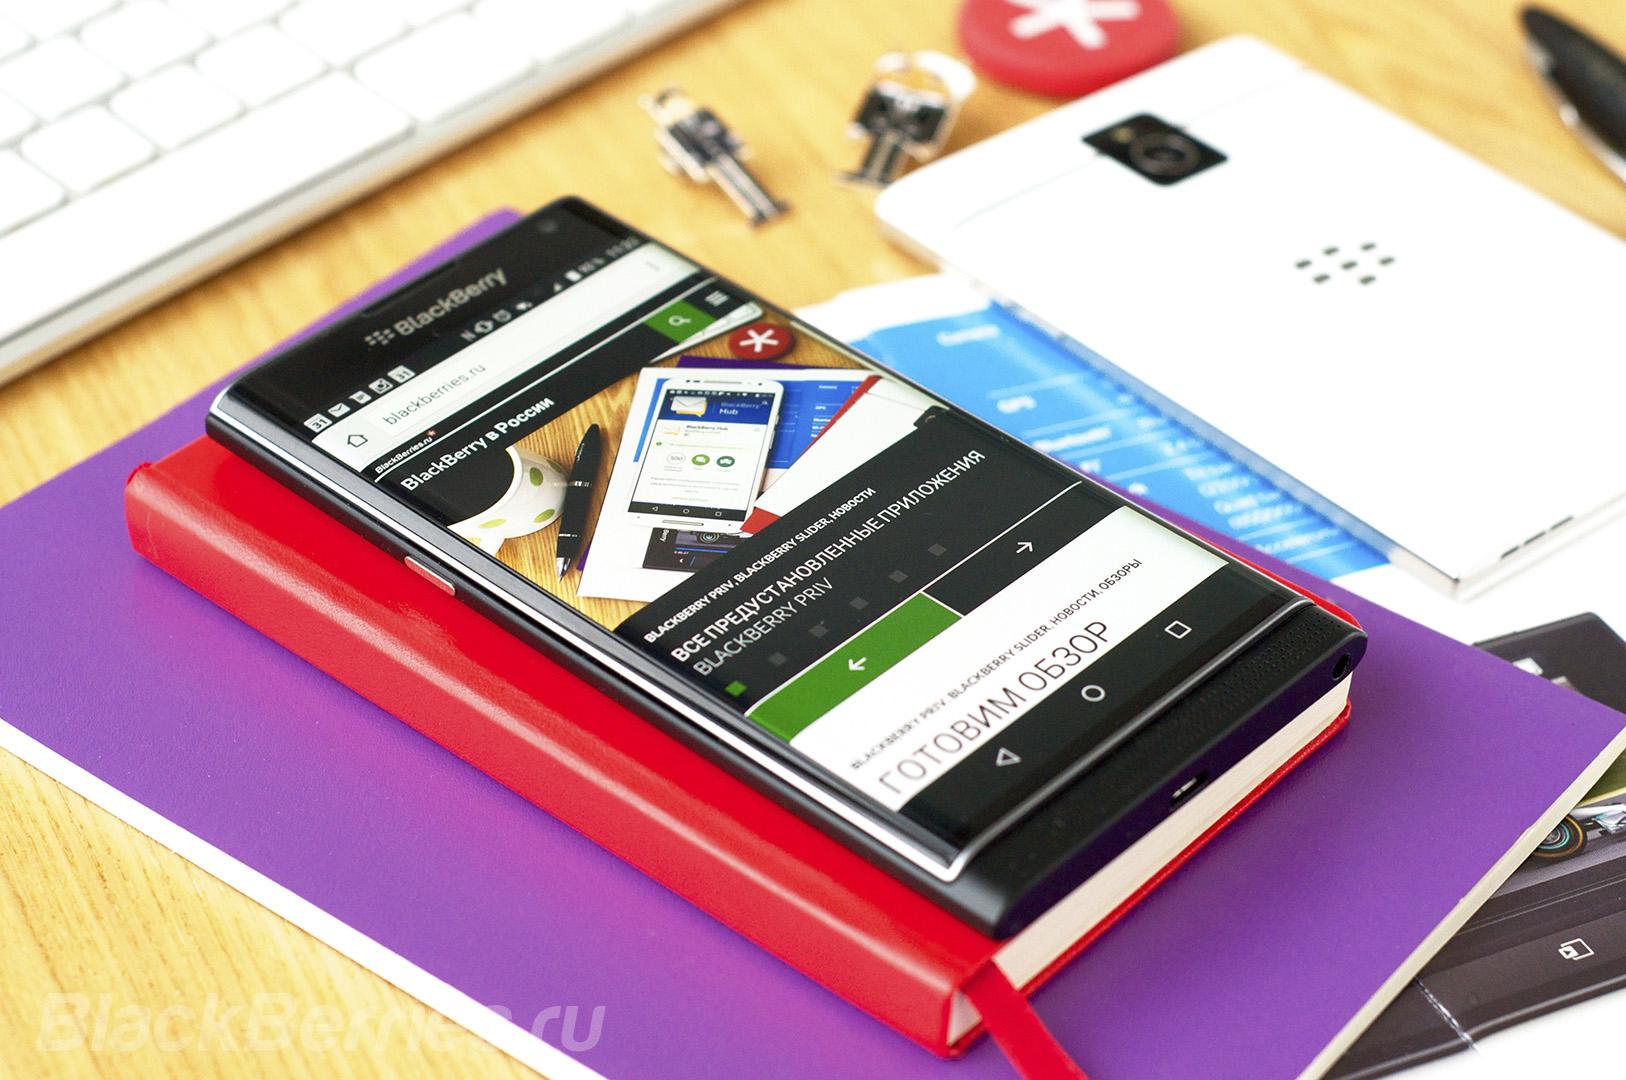 BlackBerry-Priv-Review-137